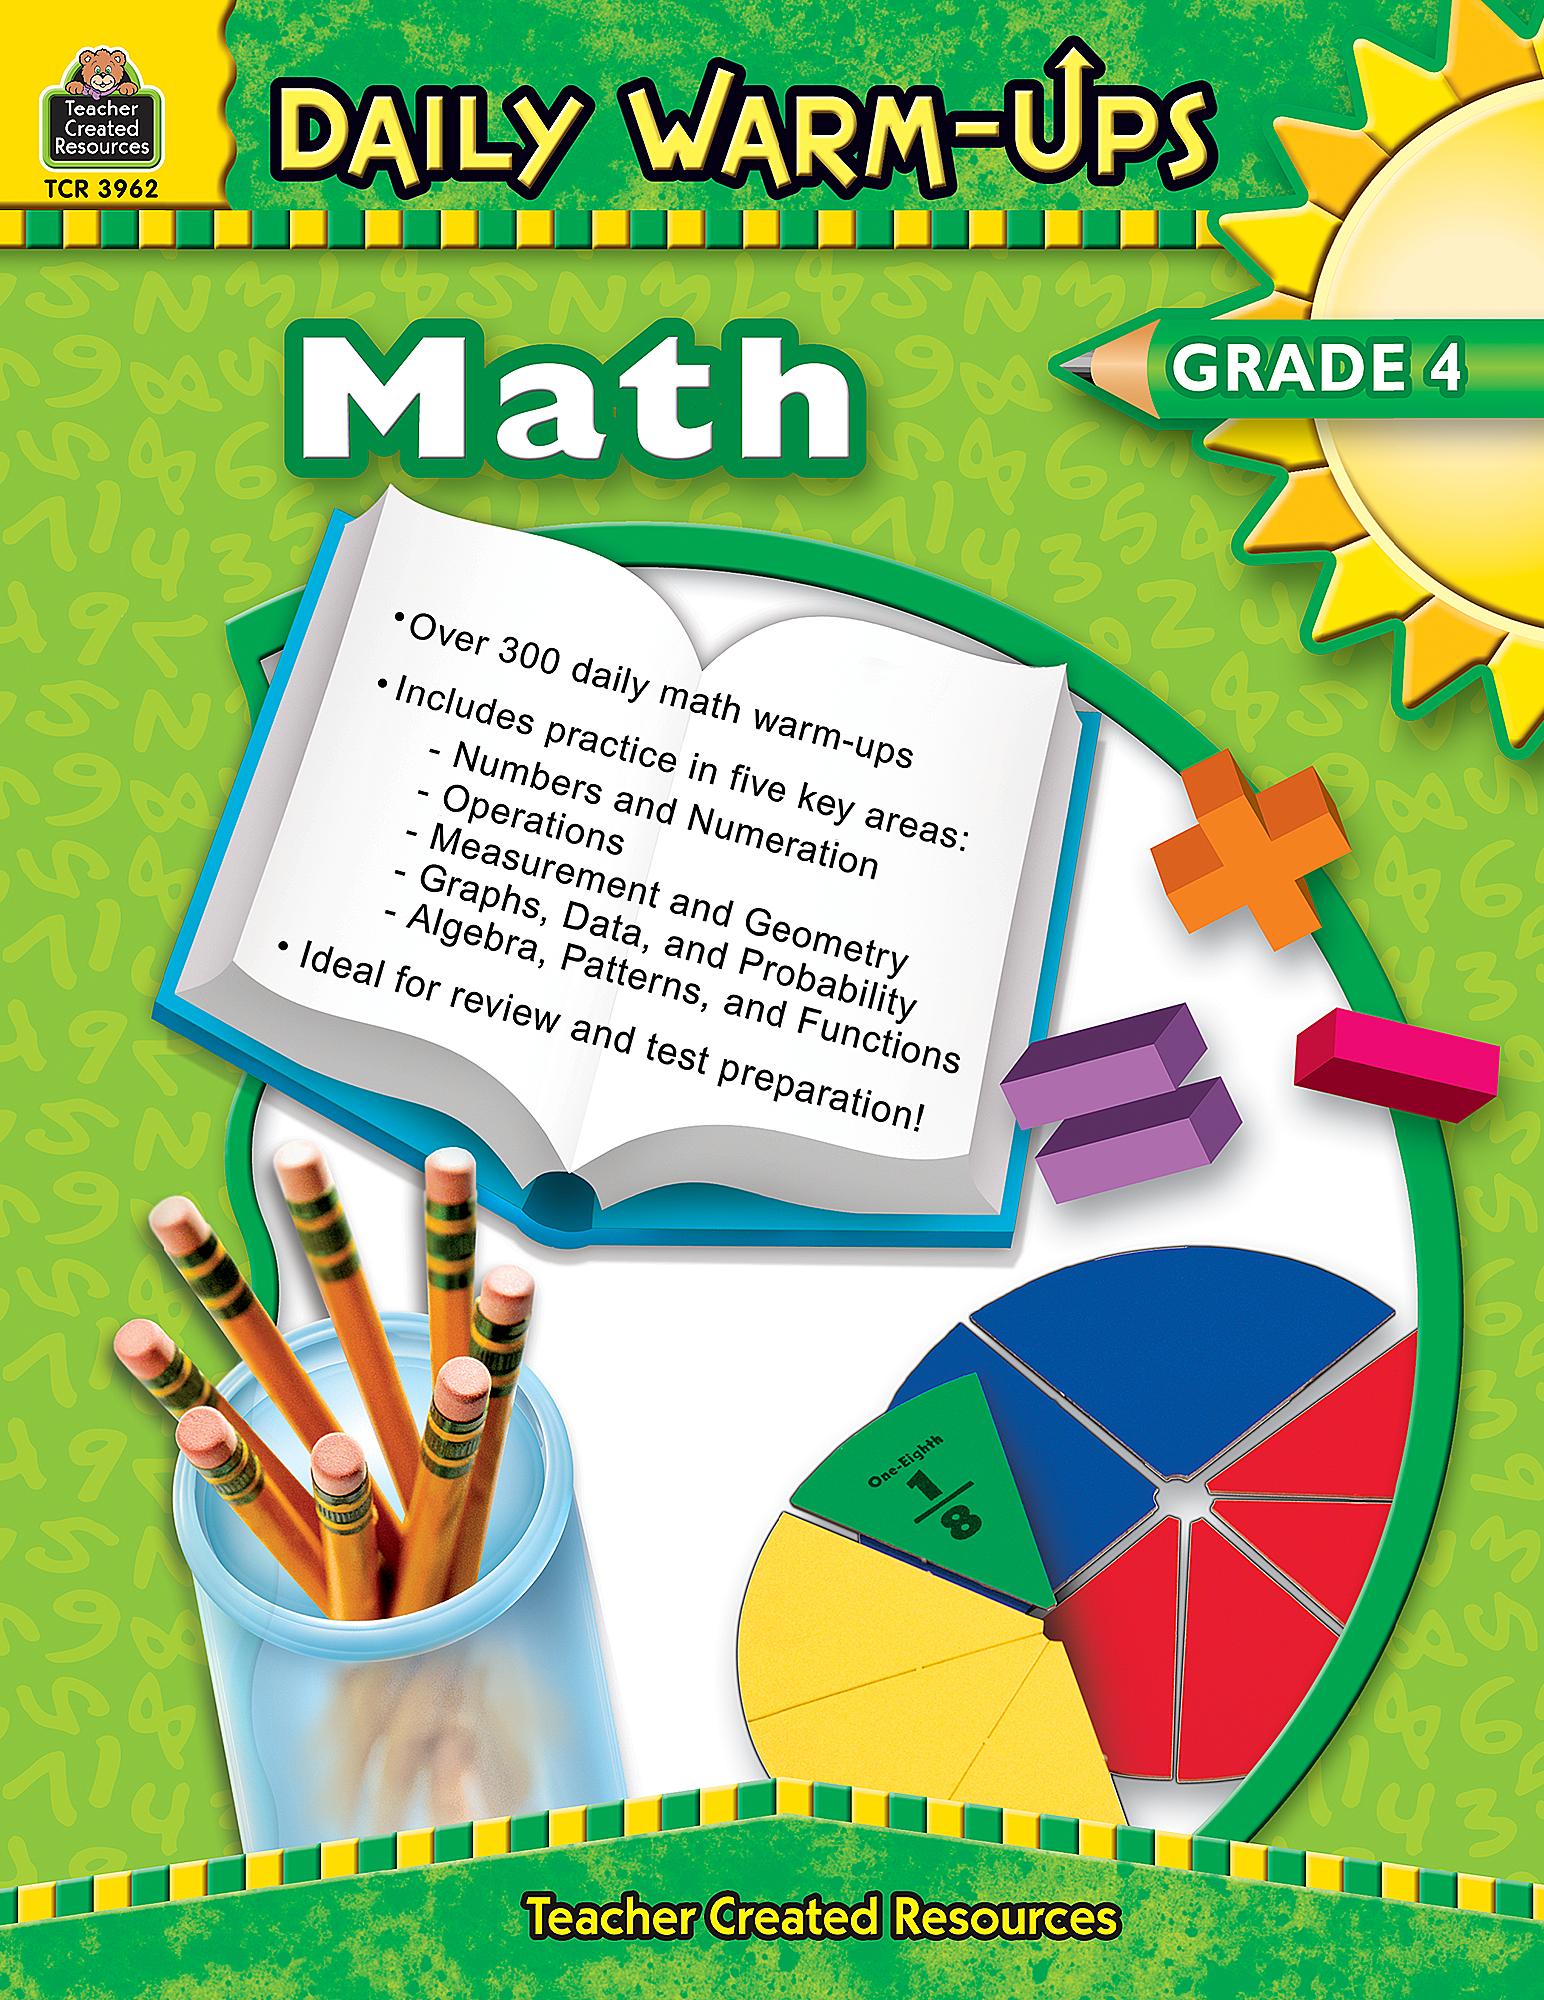 Daily Warm-Ups: Math, Grade 4 - TCR3962 | Teacher Created Resources